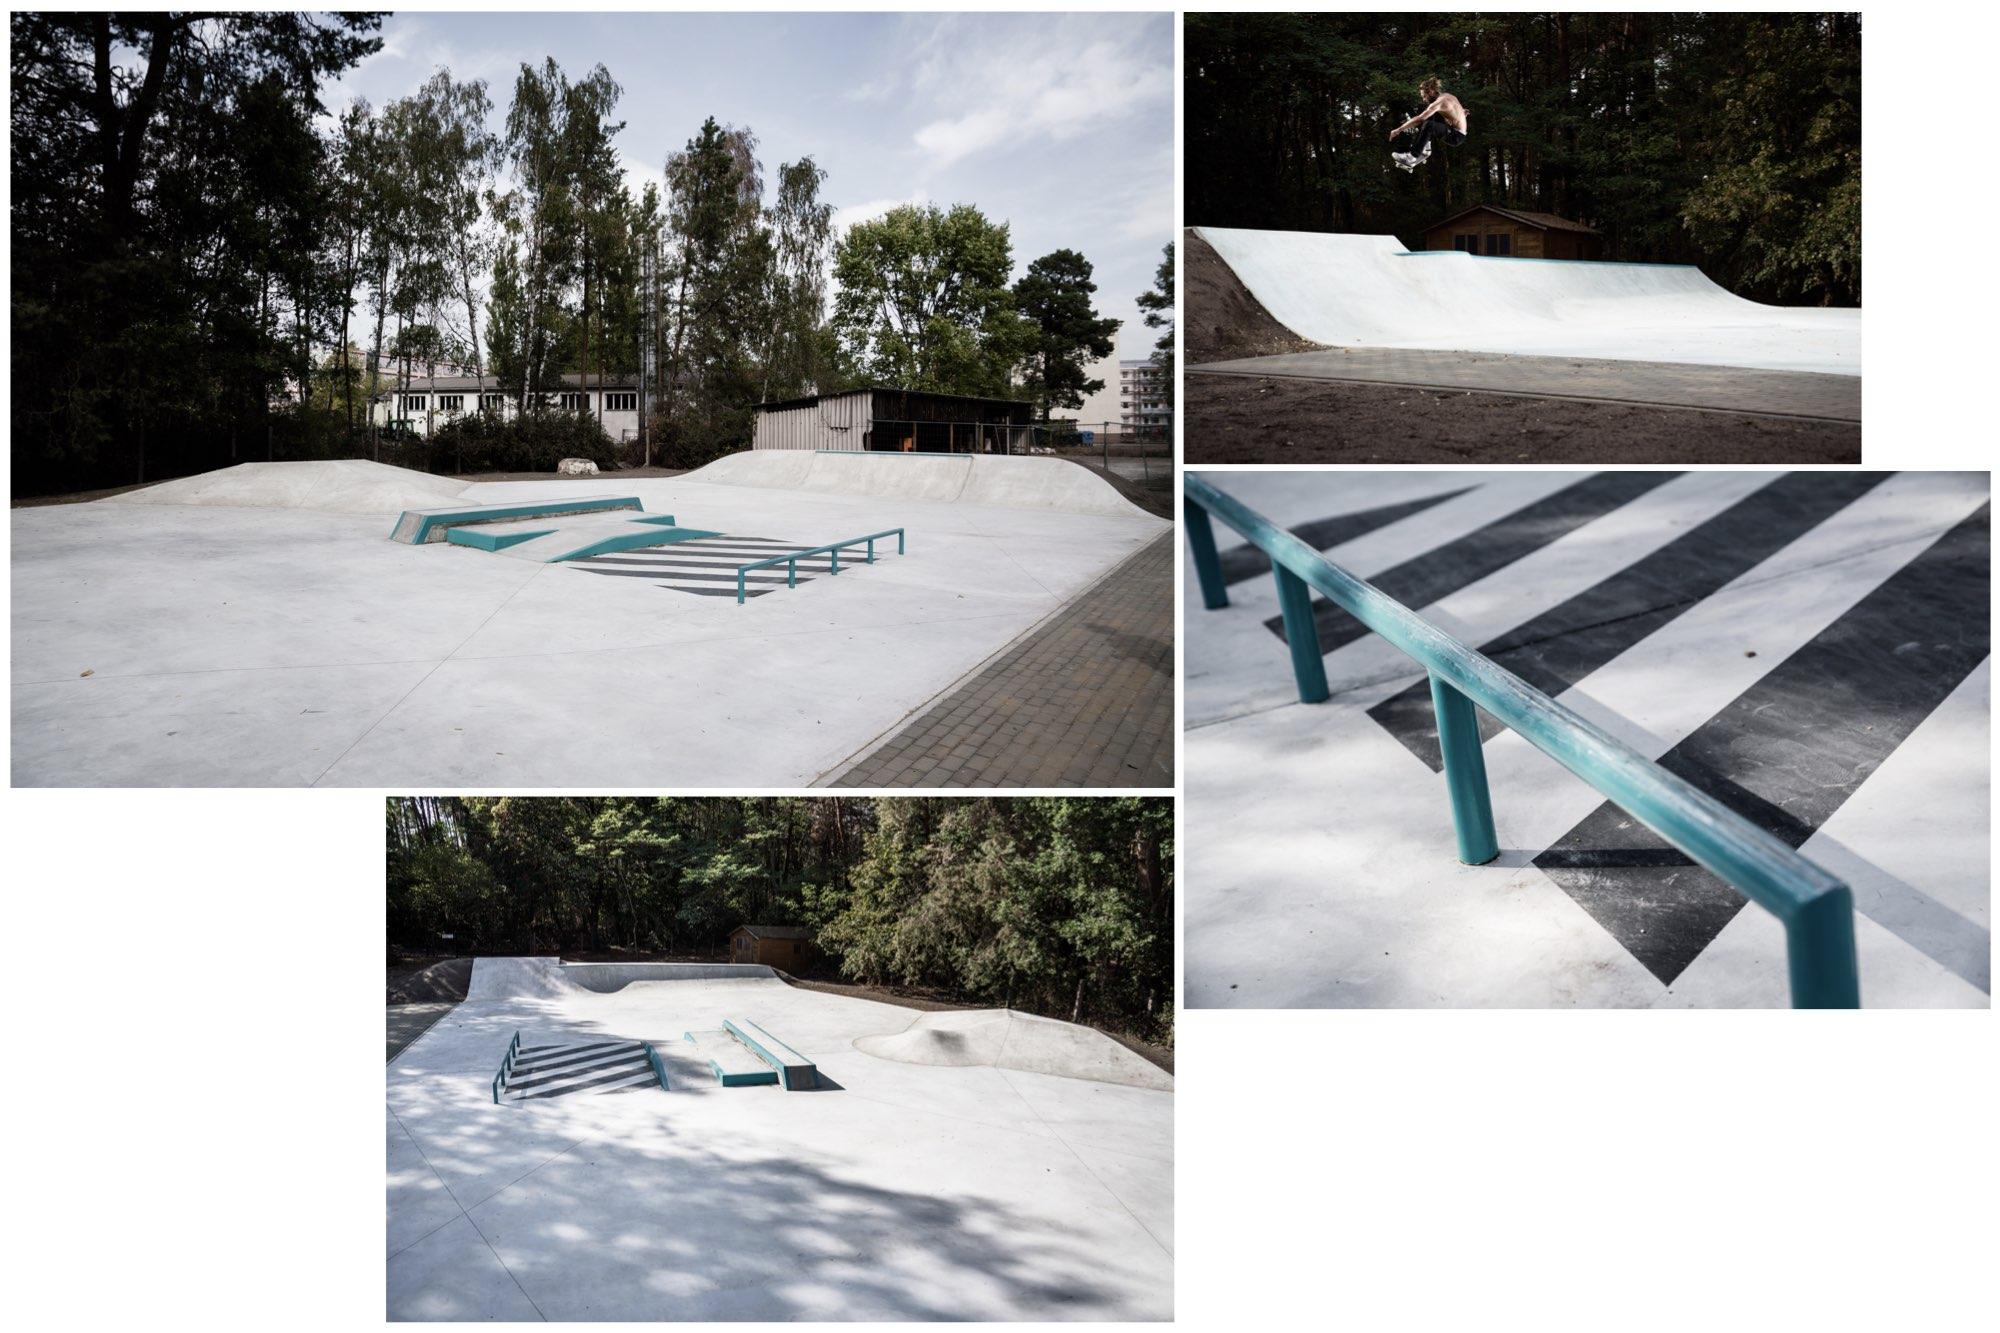 lndskt_skatepark_planung_brueck_patrick_rogalski